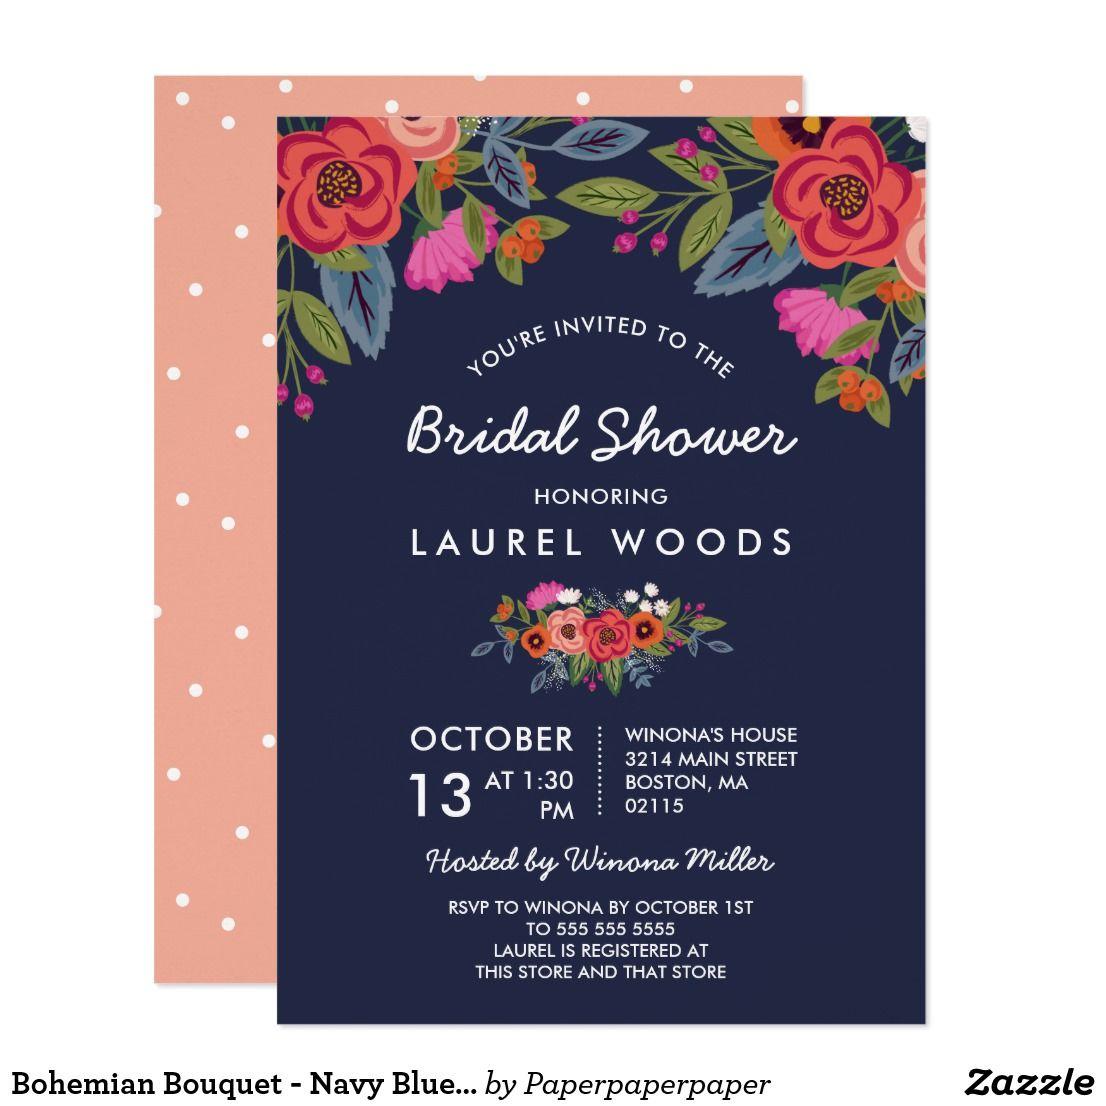 ec080f2da7f5 Bohemian Bouquet - Navy Blue Bridal Shower Card Floral bridal shower  invitation in dark blue with flower arrangements in orange